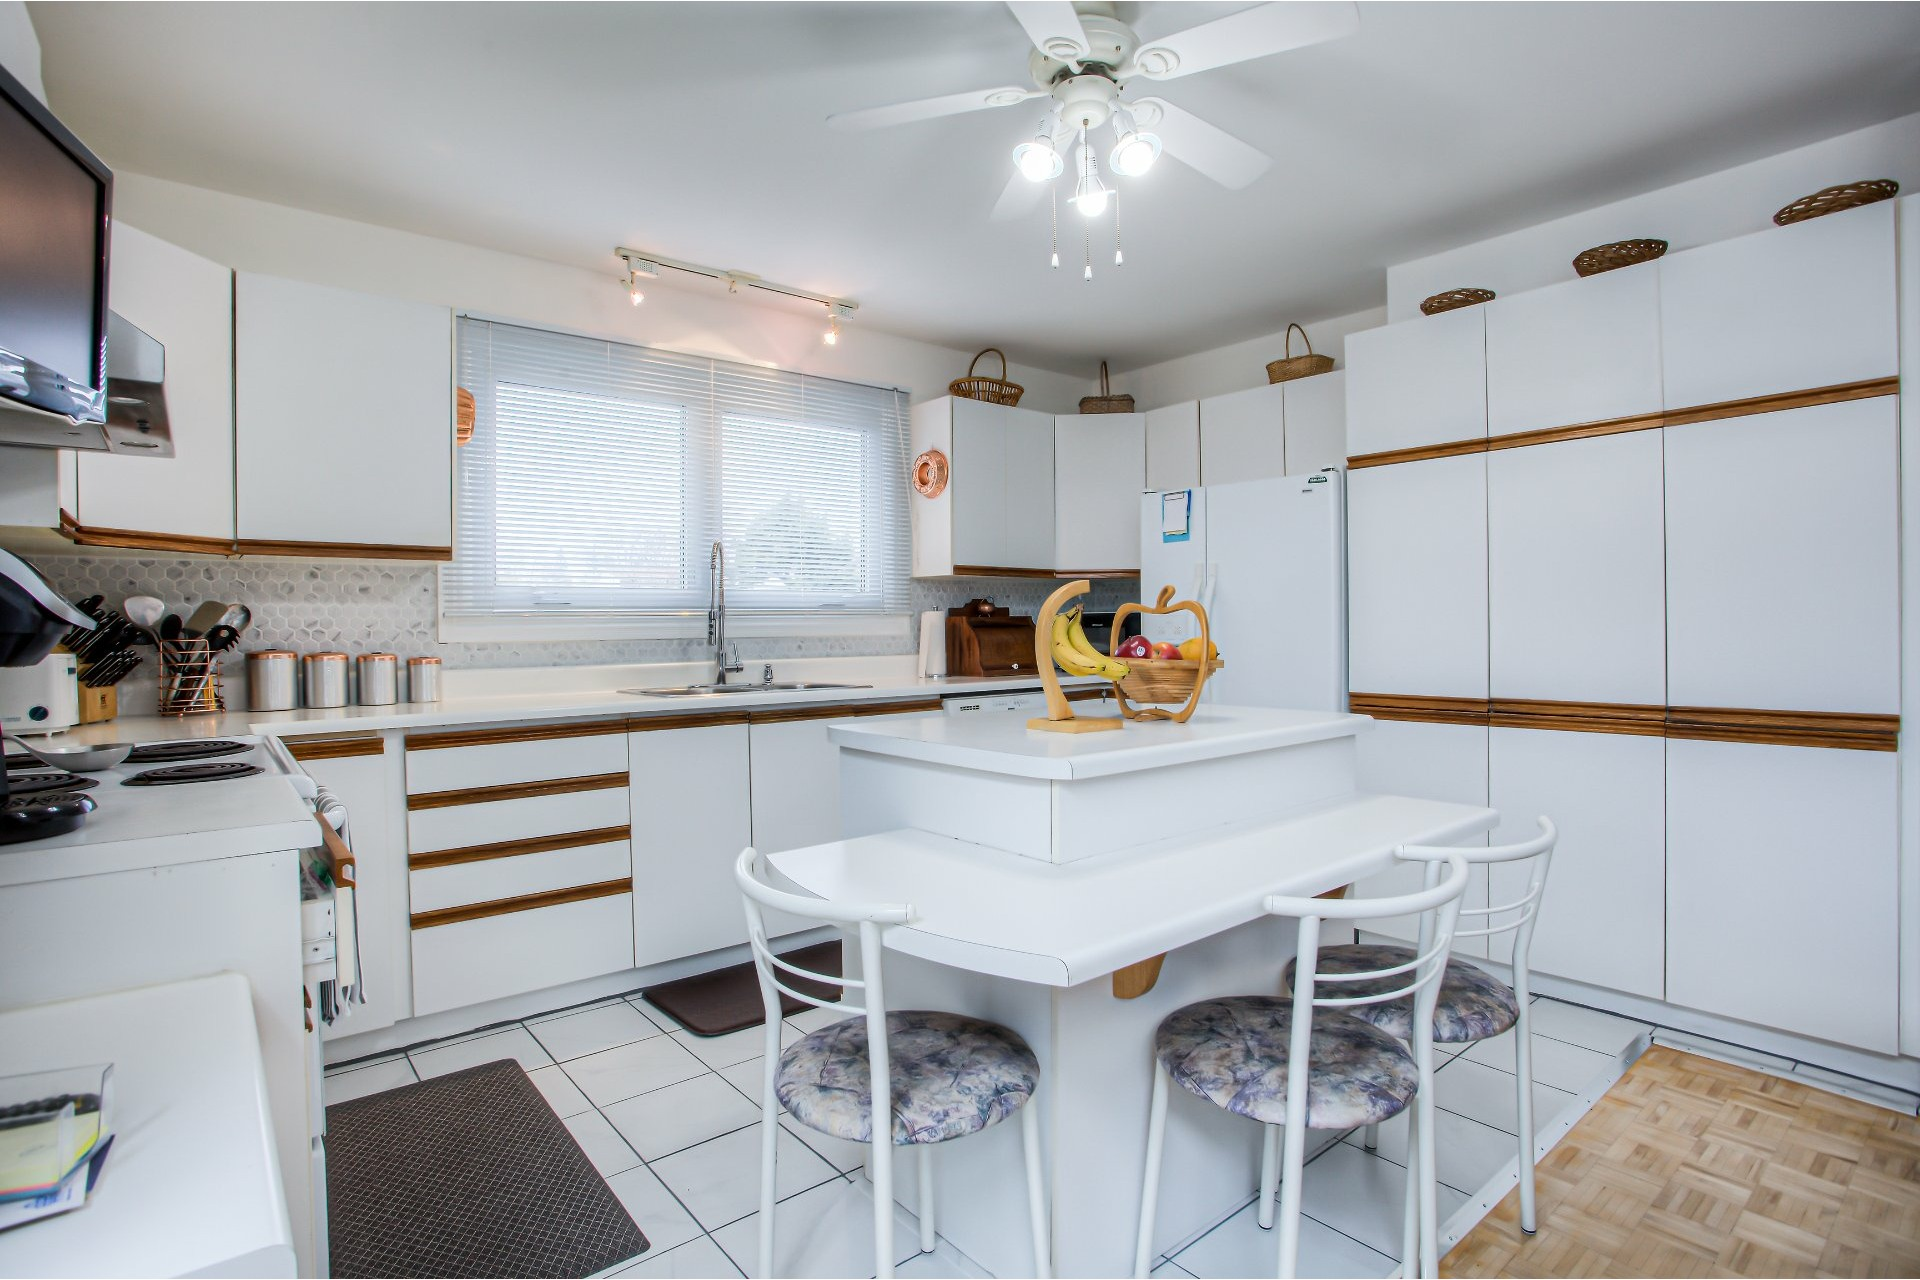 image 28 - MX - Casa sola - MX En venta Dollard-Des Ormeaux - 11 habitaciones